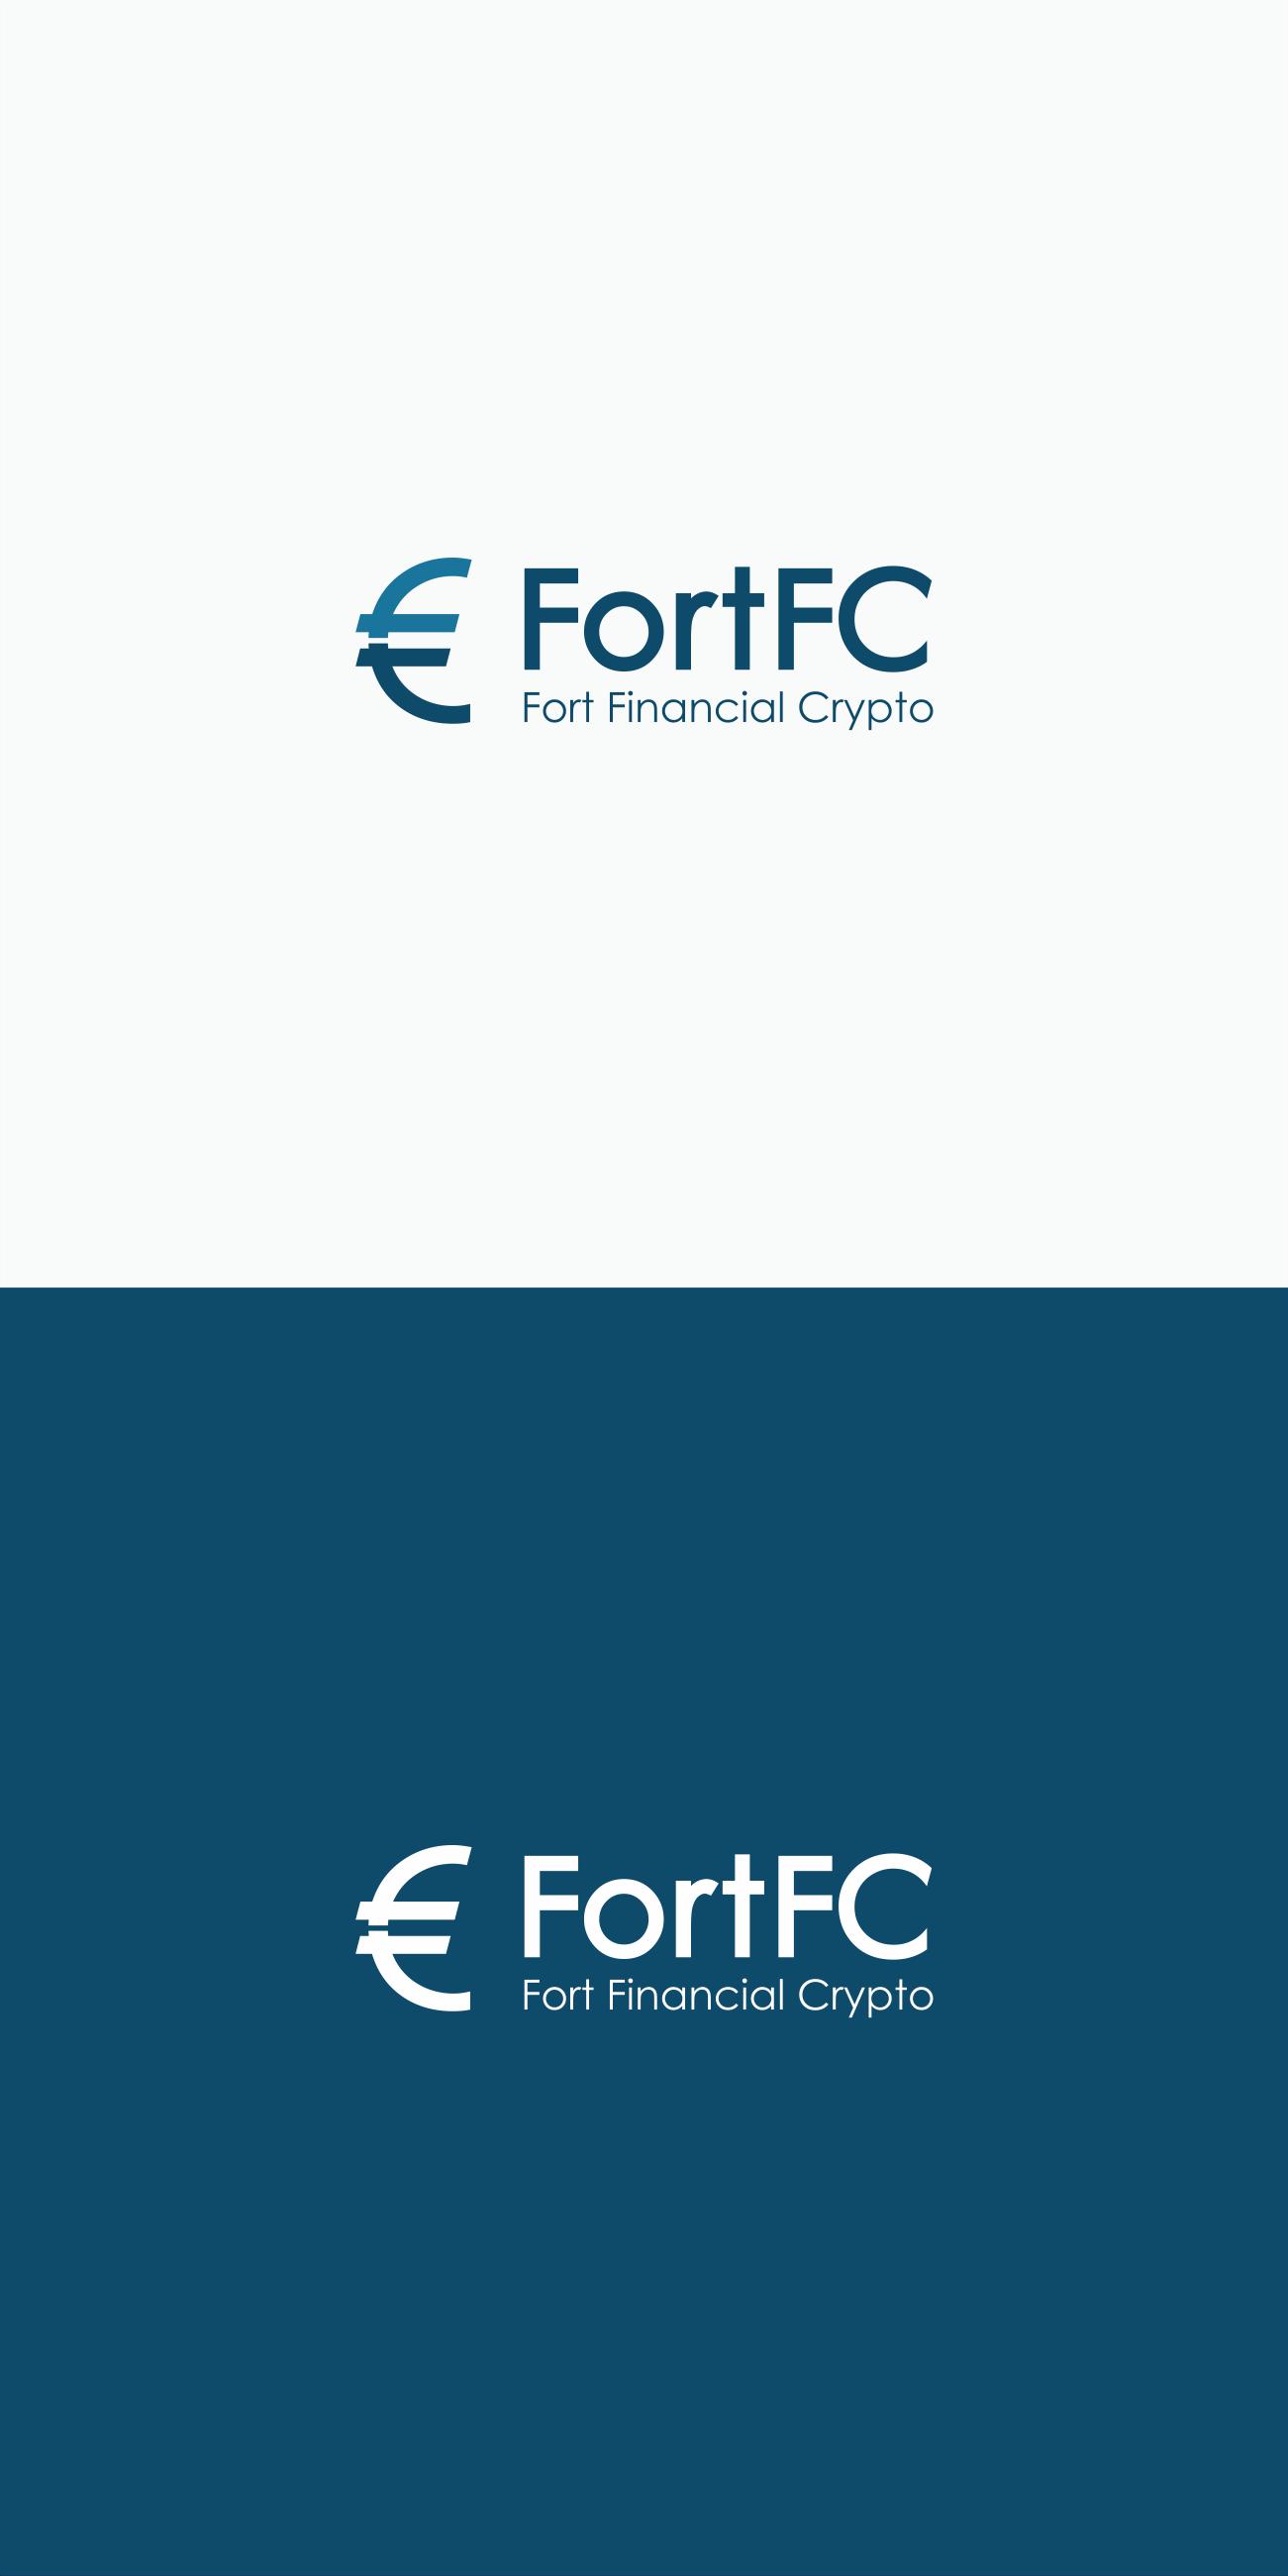 Разработка логотипа финансовой компании фото f_0405a8df8090685e.png